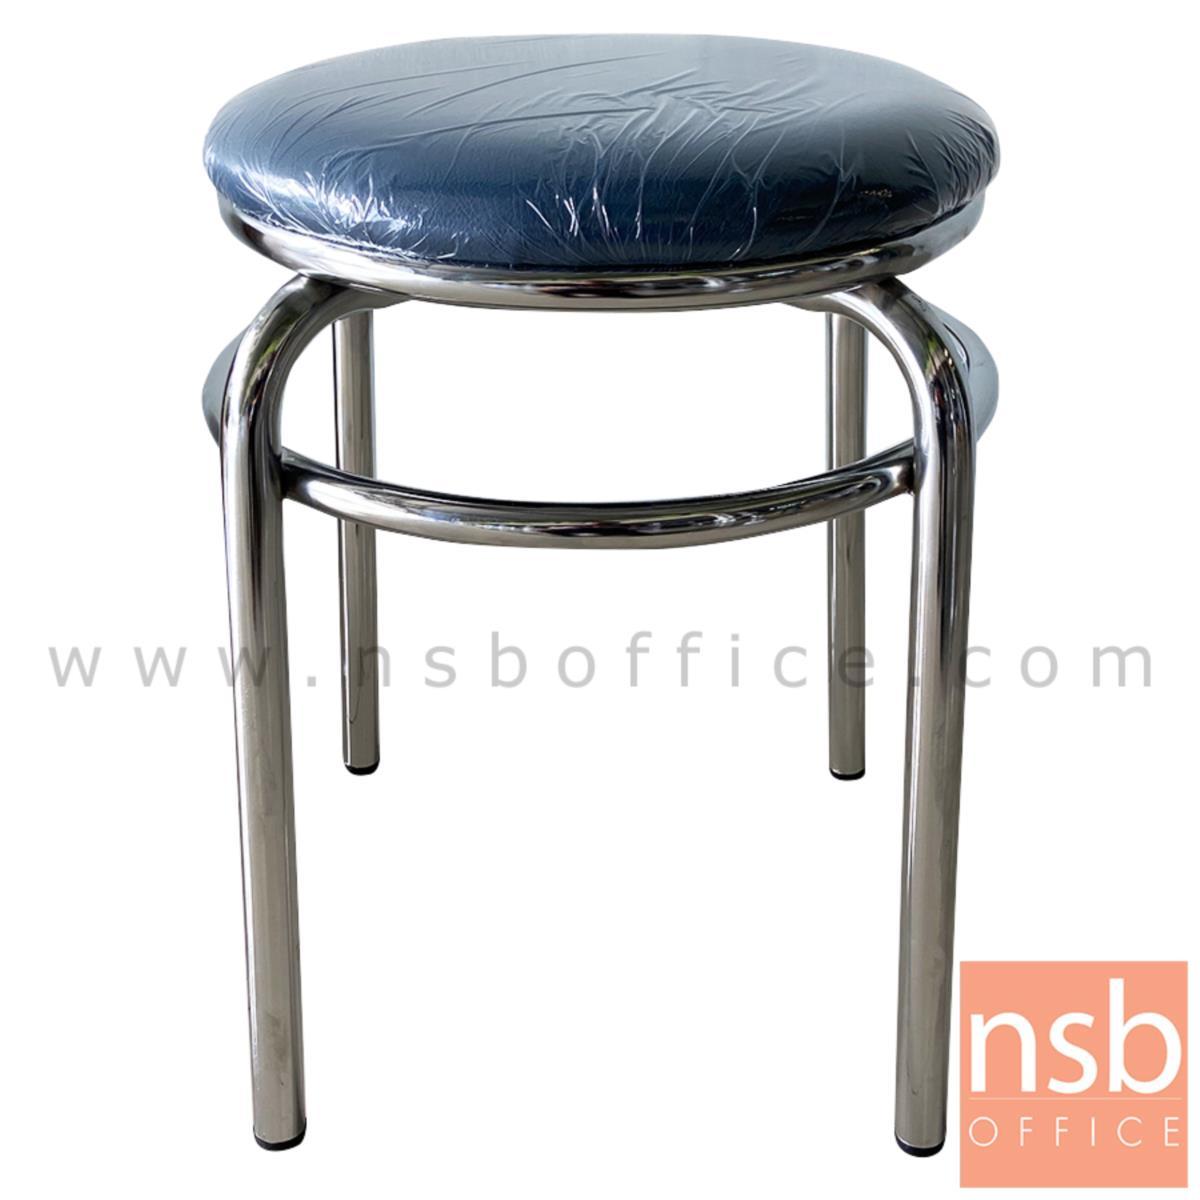 B10A086:เก้าอี้สตูลกลมใหญ่ ที่นั่งเบาะหนังเทียม twin ring ขาเหล็ก